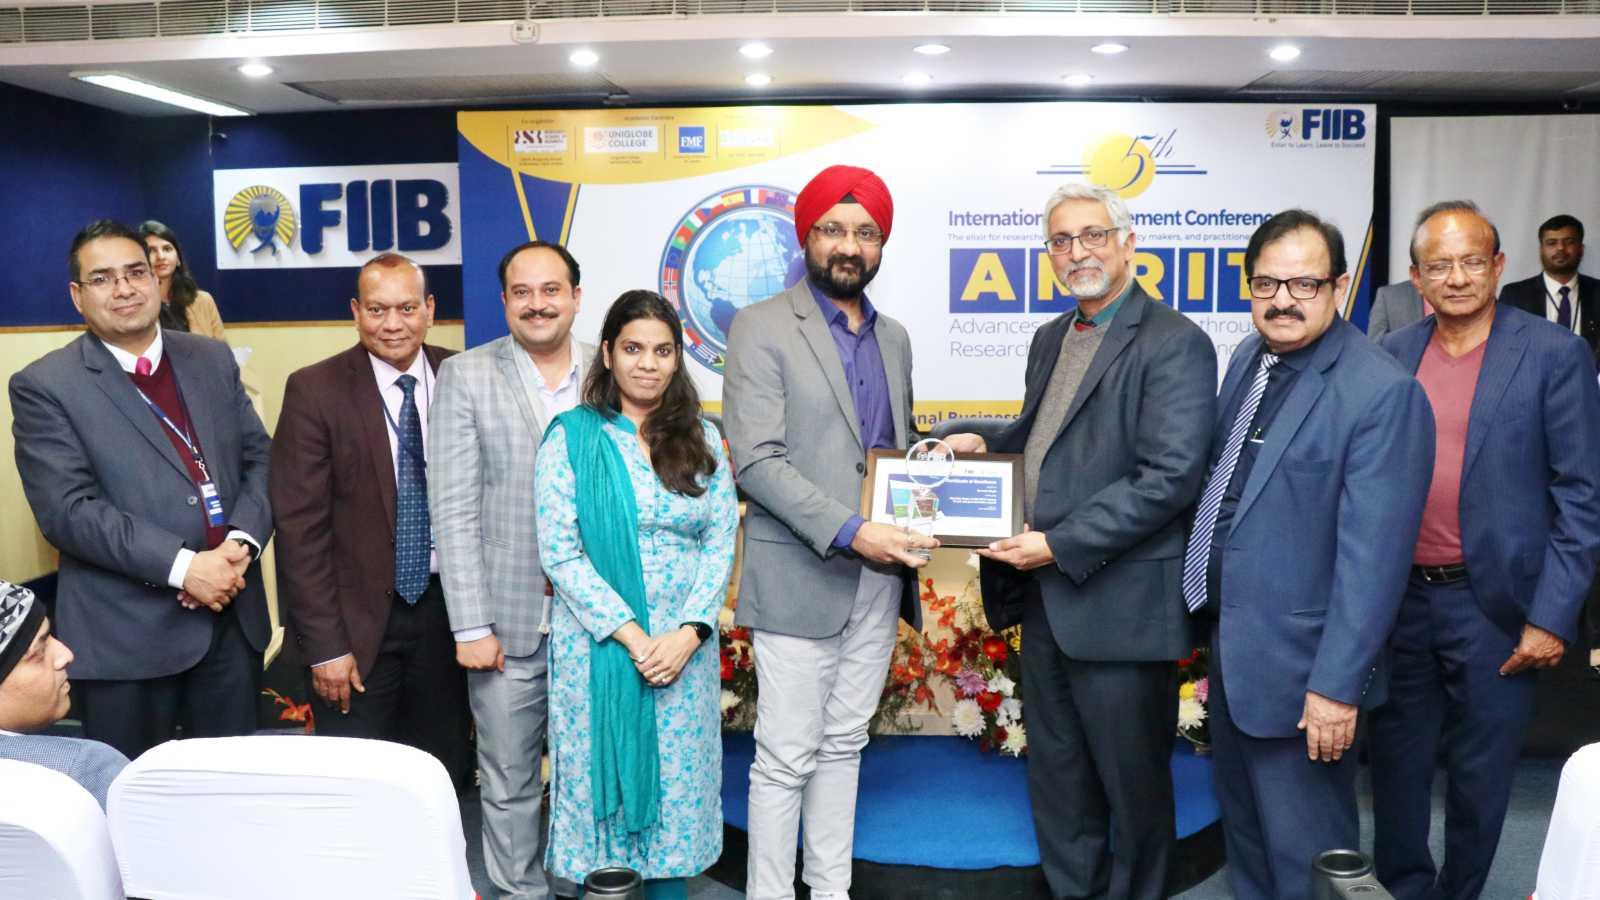 Dr. Gurmeet Singh honoured for his Research Paper Image